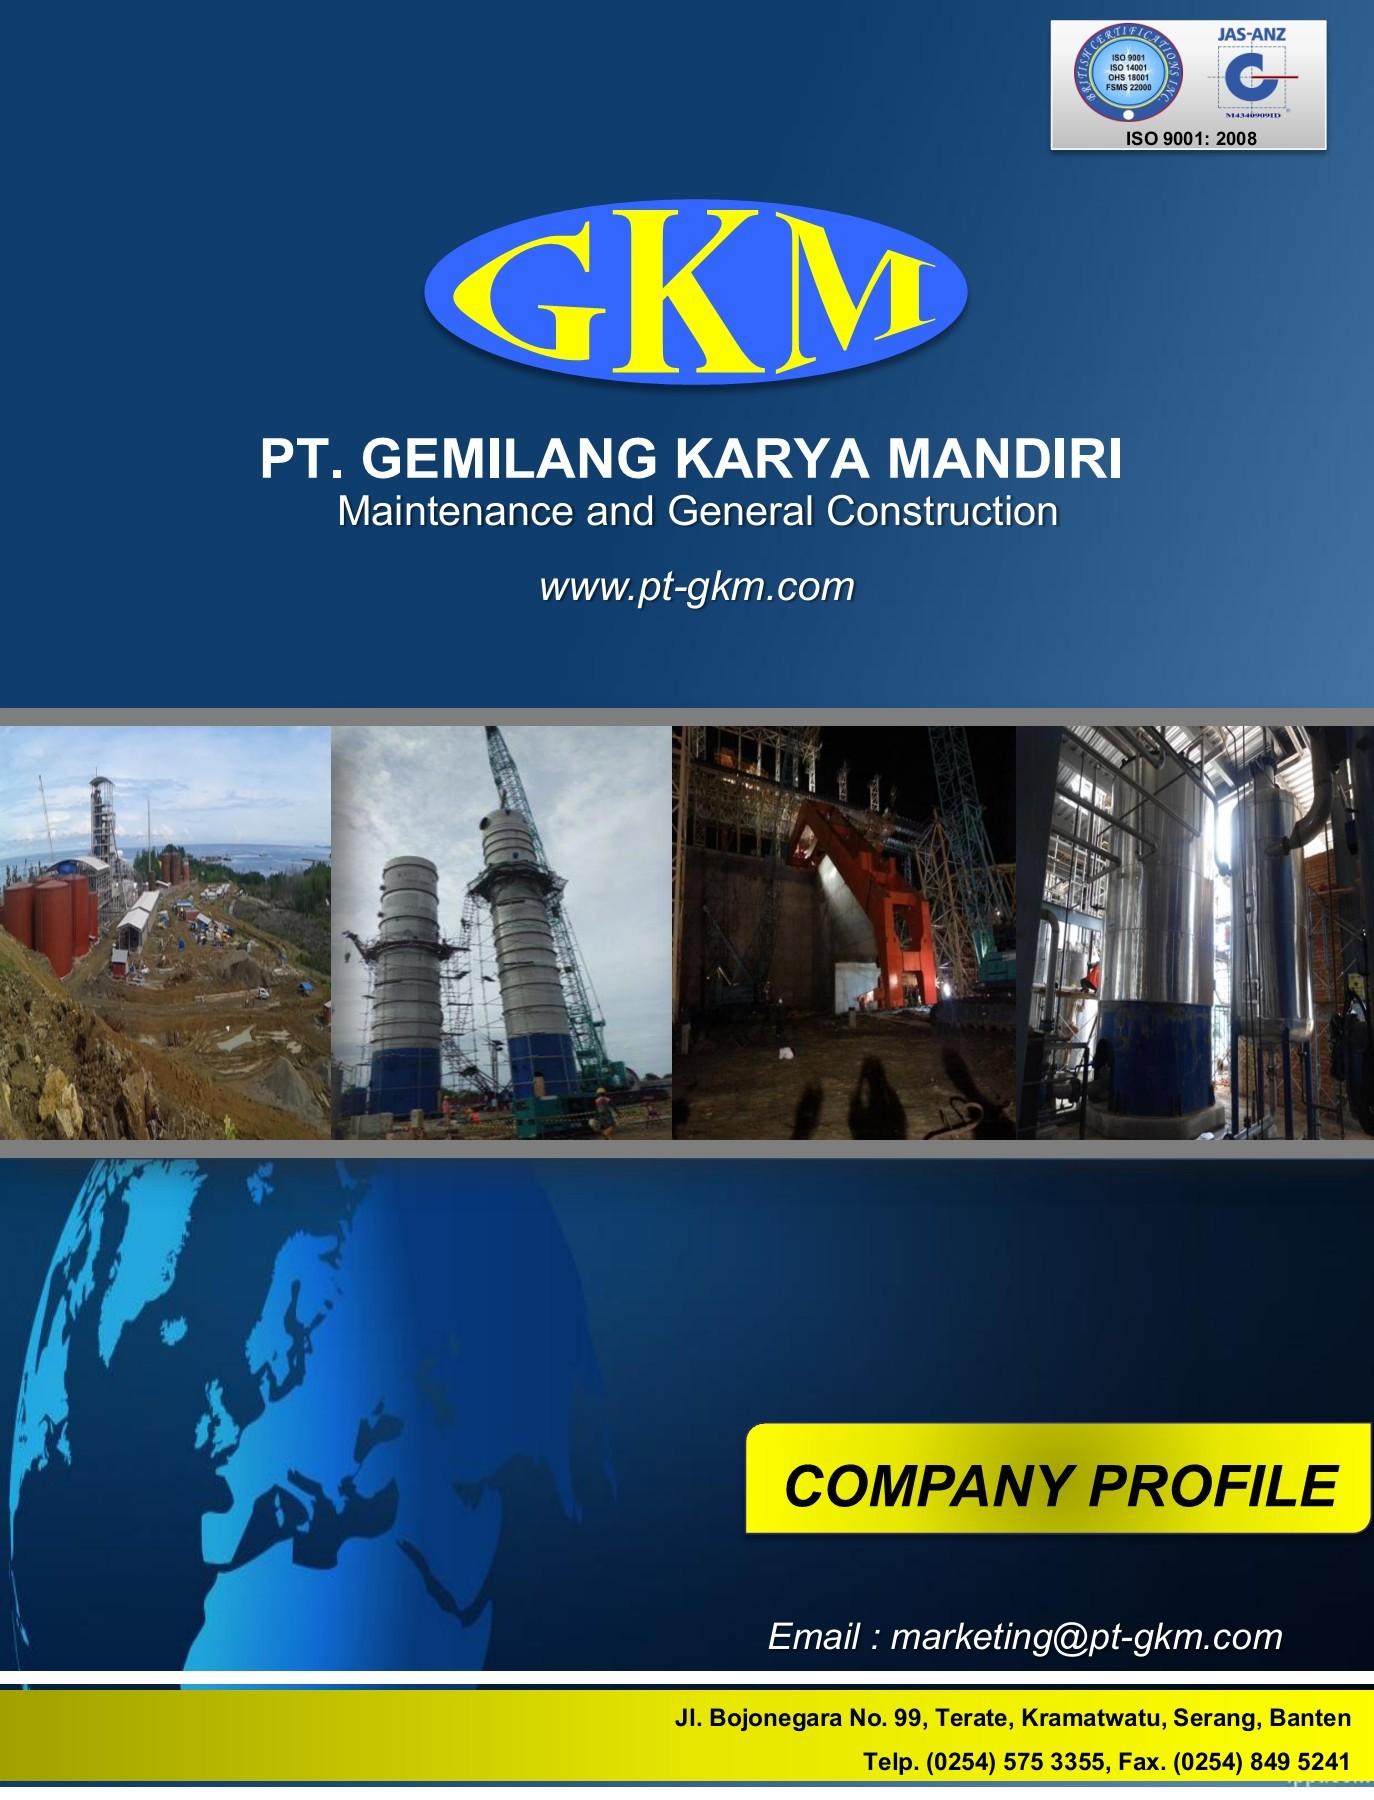 Company Profil Pt Gkm Flip Book Pages 1 35 Pubhtml5